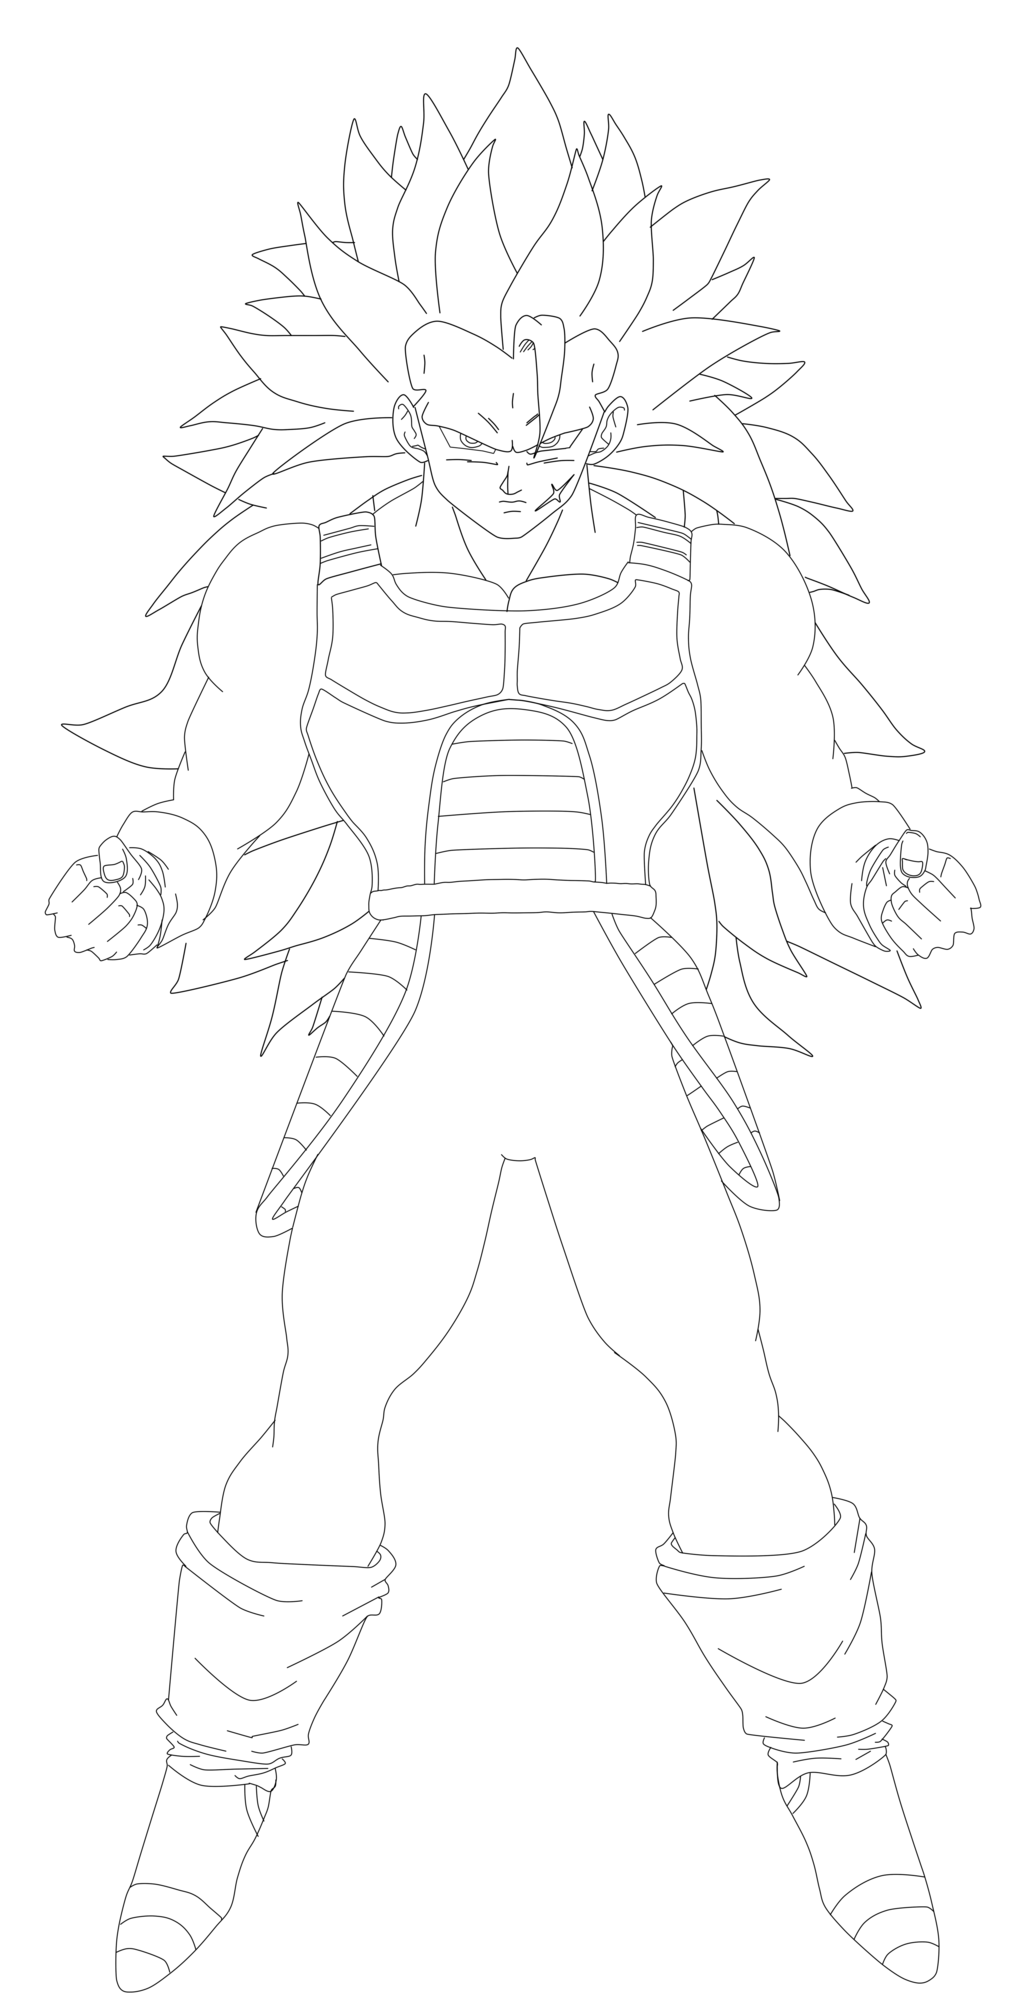 jpg black and white stock bardock drawing ssj3 #89876749